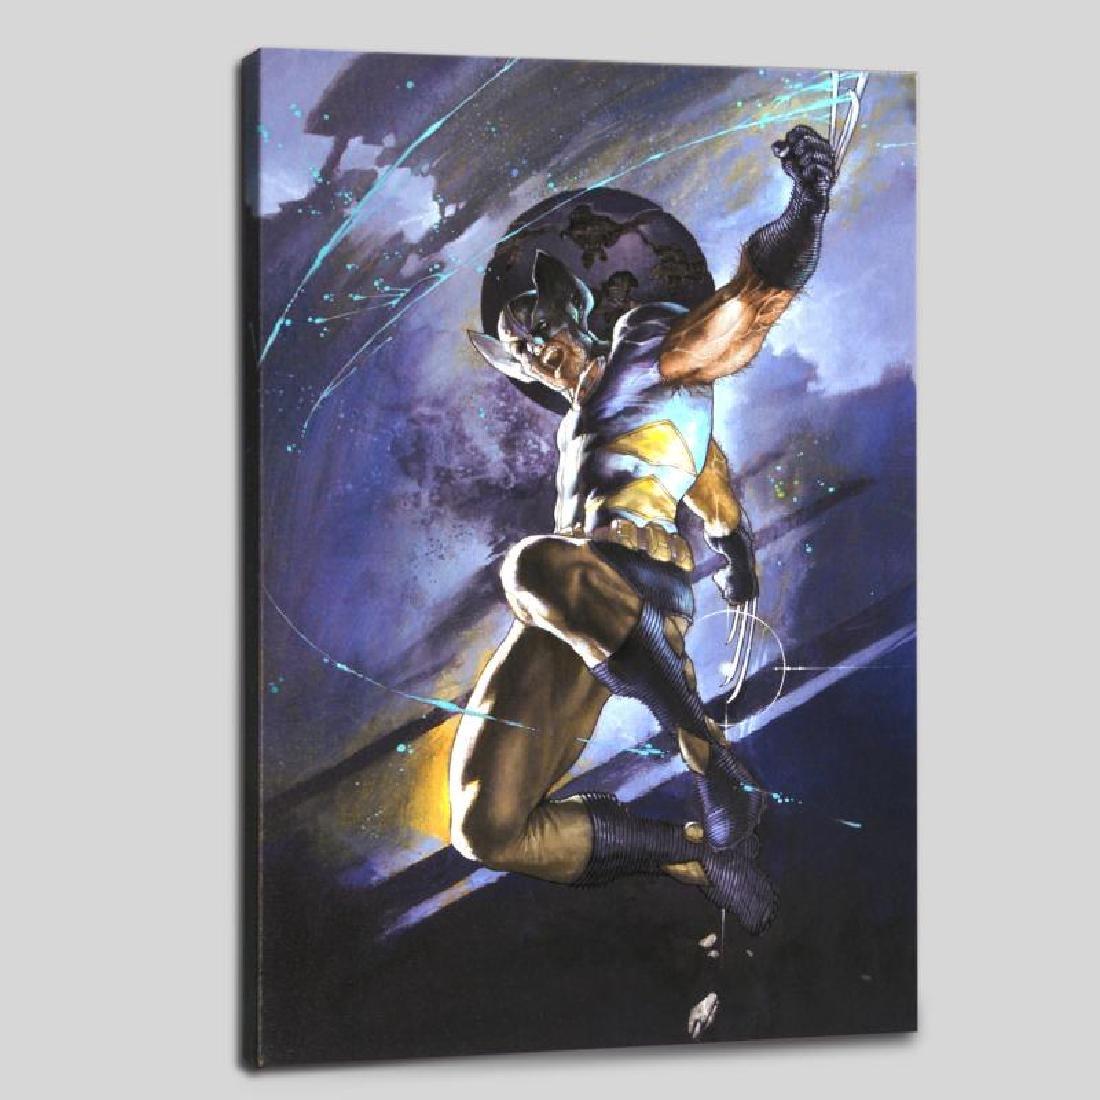 Uncanny X-Men #539 by Marvel Comics